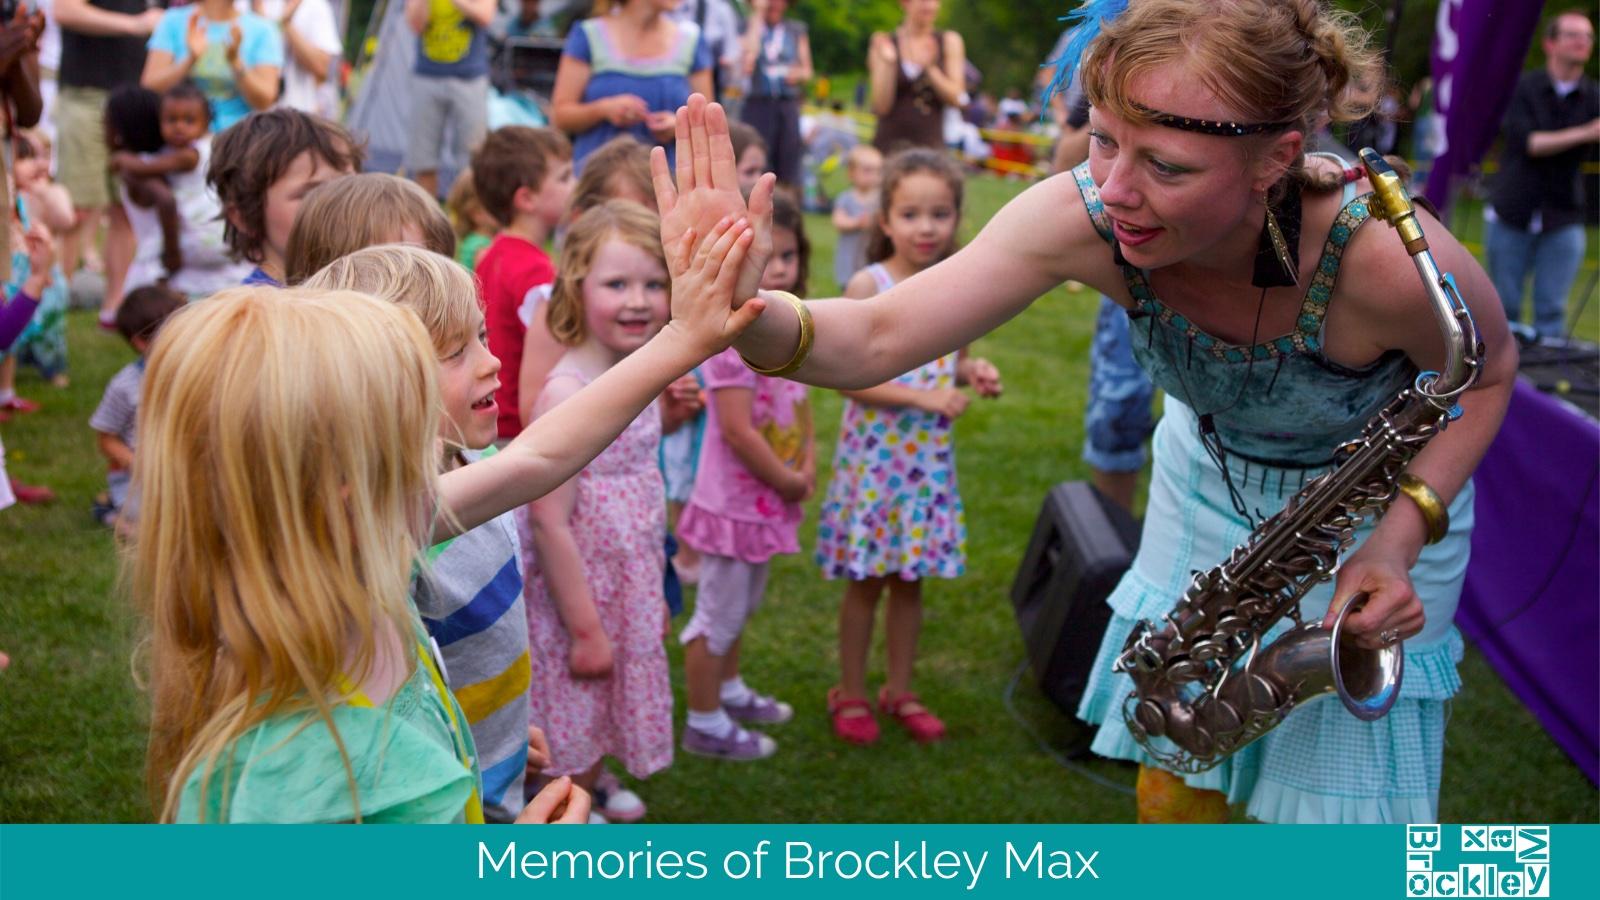 Memories of Brockley Max